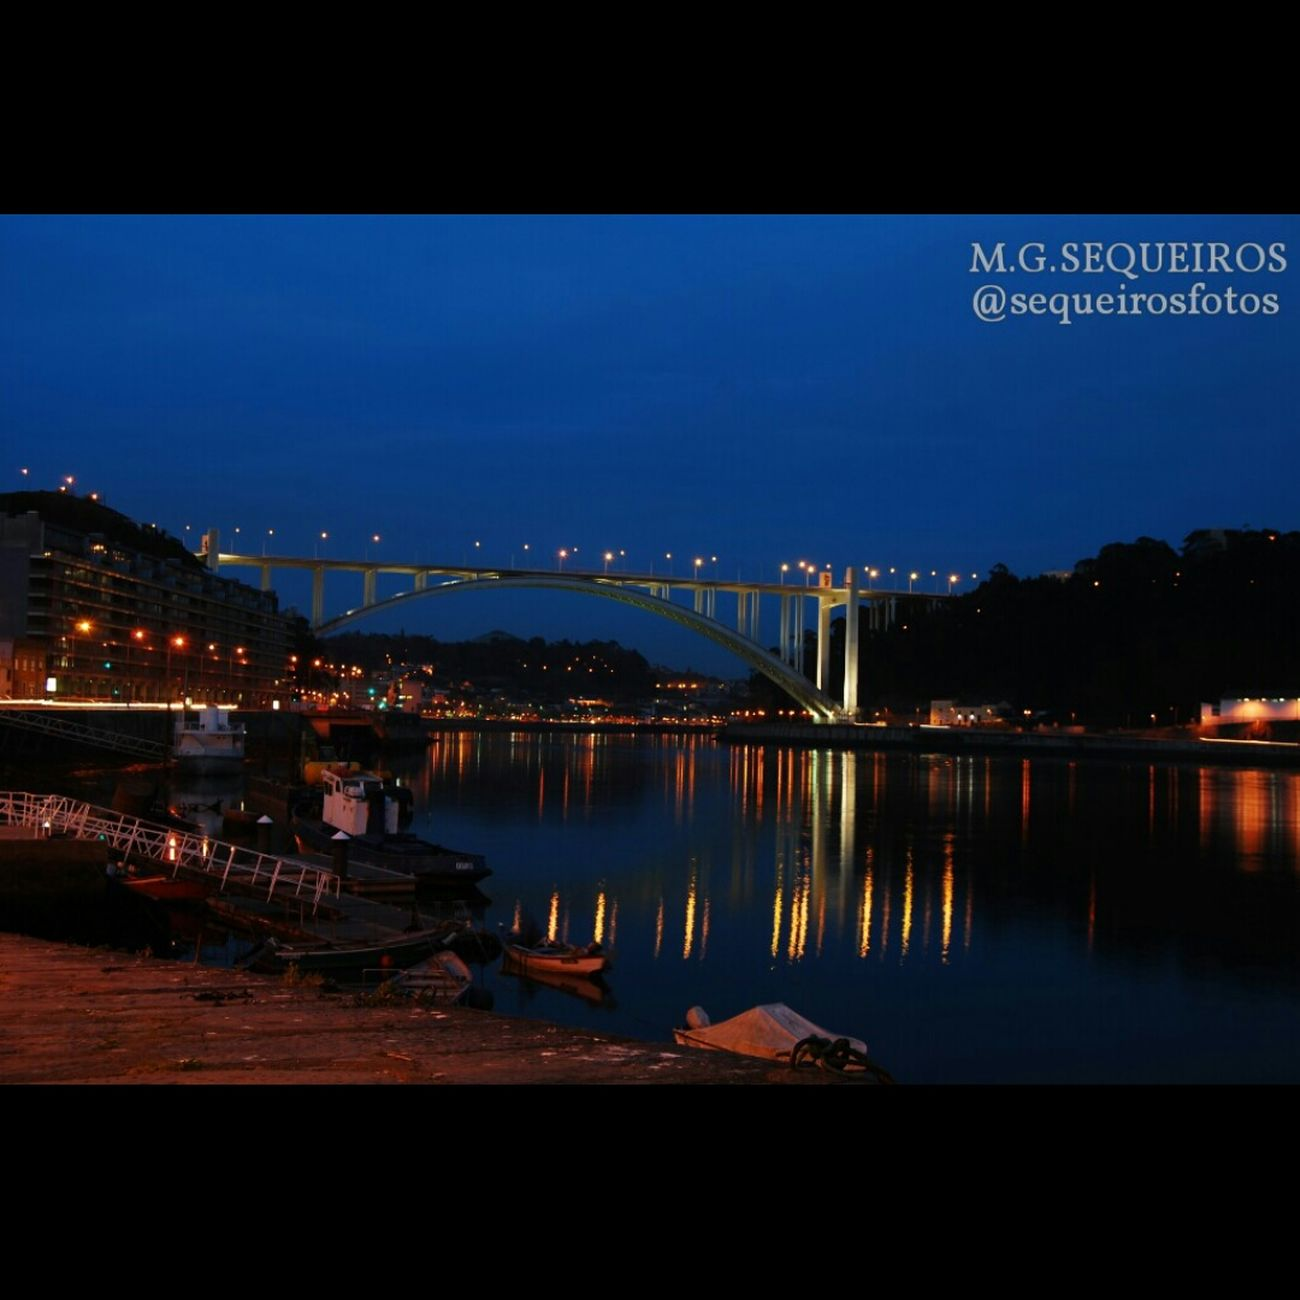 Puente de Luiz I Oporto Luiz I Bridge Eye4photography  Perfect Photography